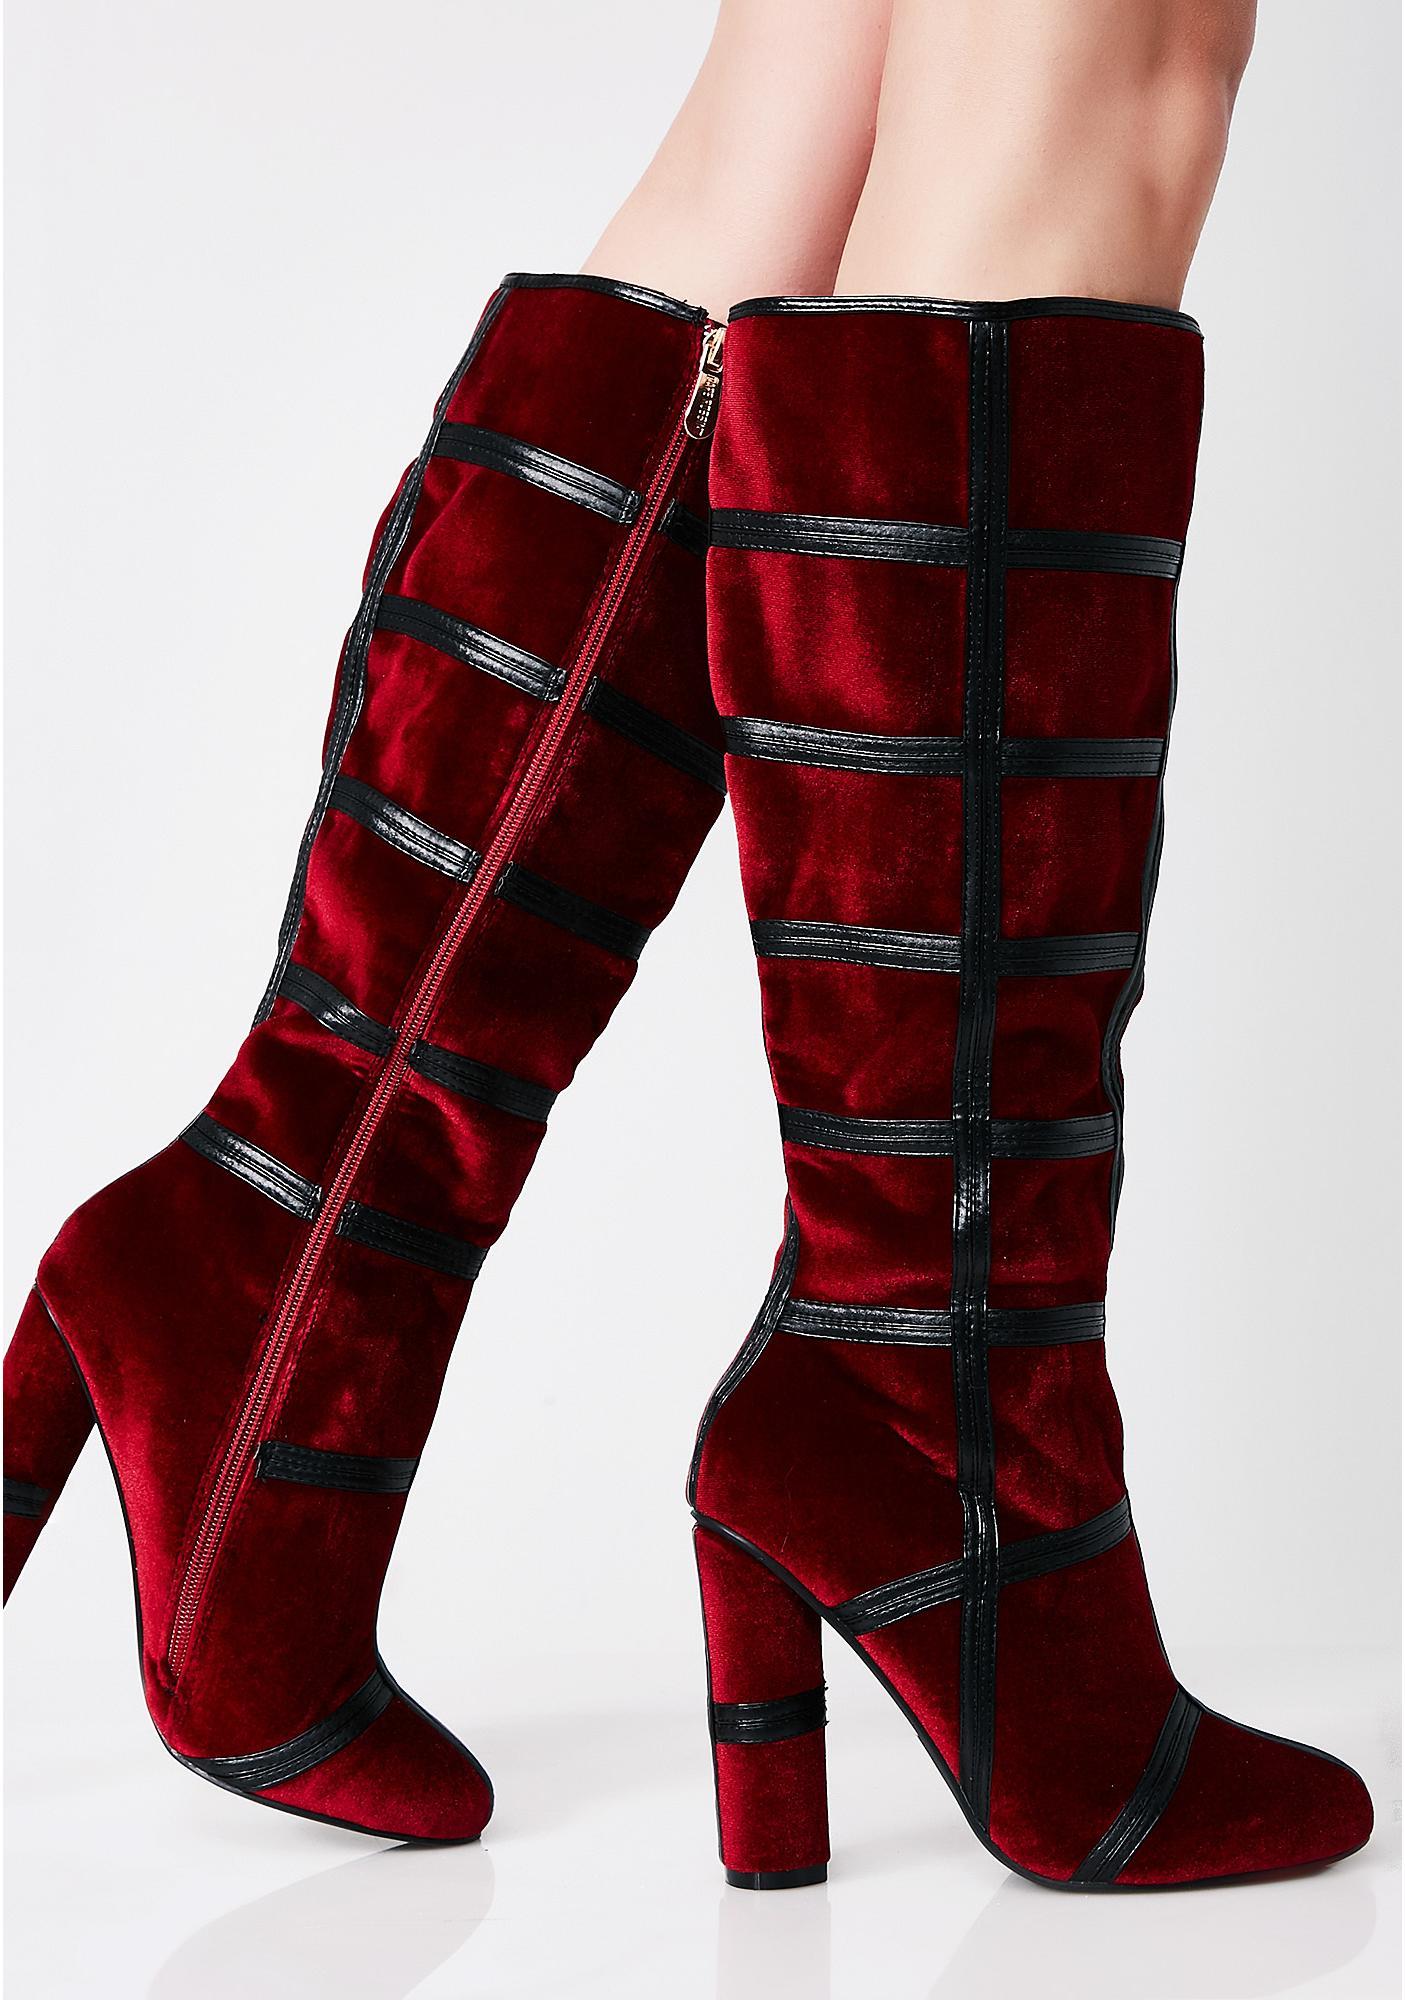 Venom Potion Knee High Boots